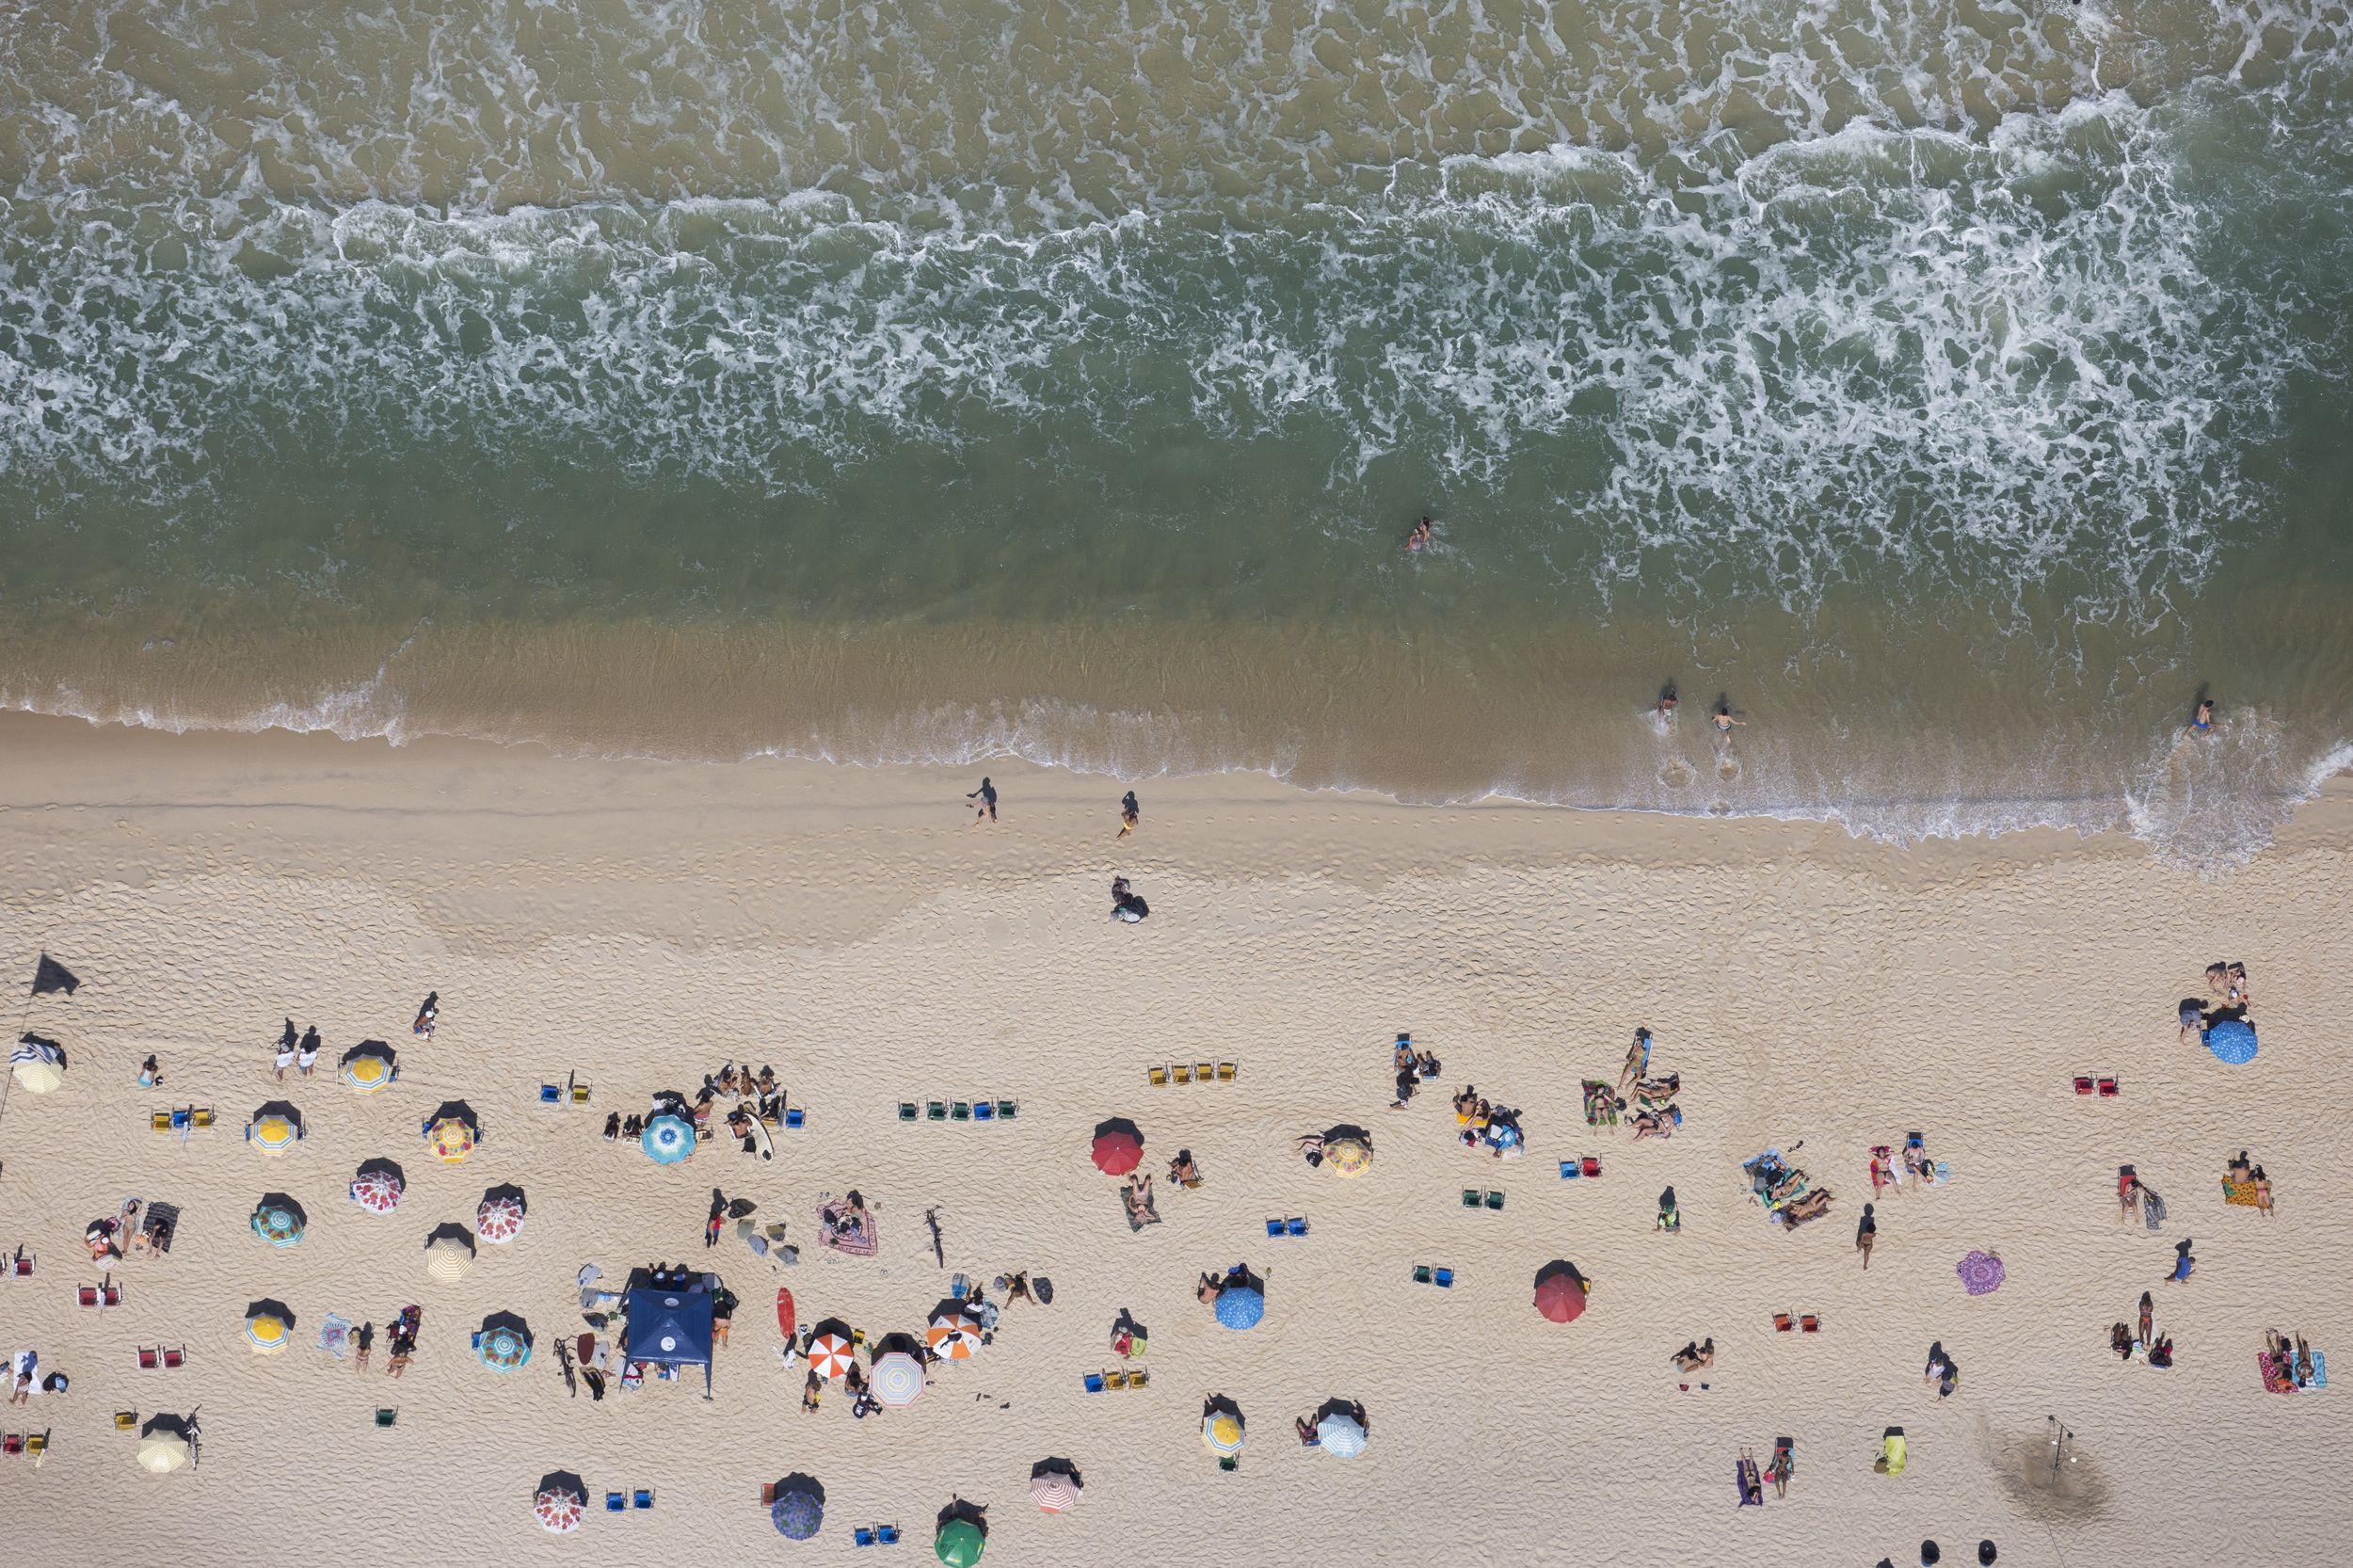 People sunbathe at Ipanema beach in Rio de Janeiro, Brazil, Monday, Aug. 1, 2016. The Summer Games start Aug. 5. (AP Photo/Felipe Dana) via…